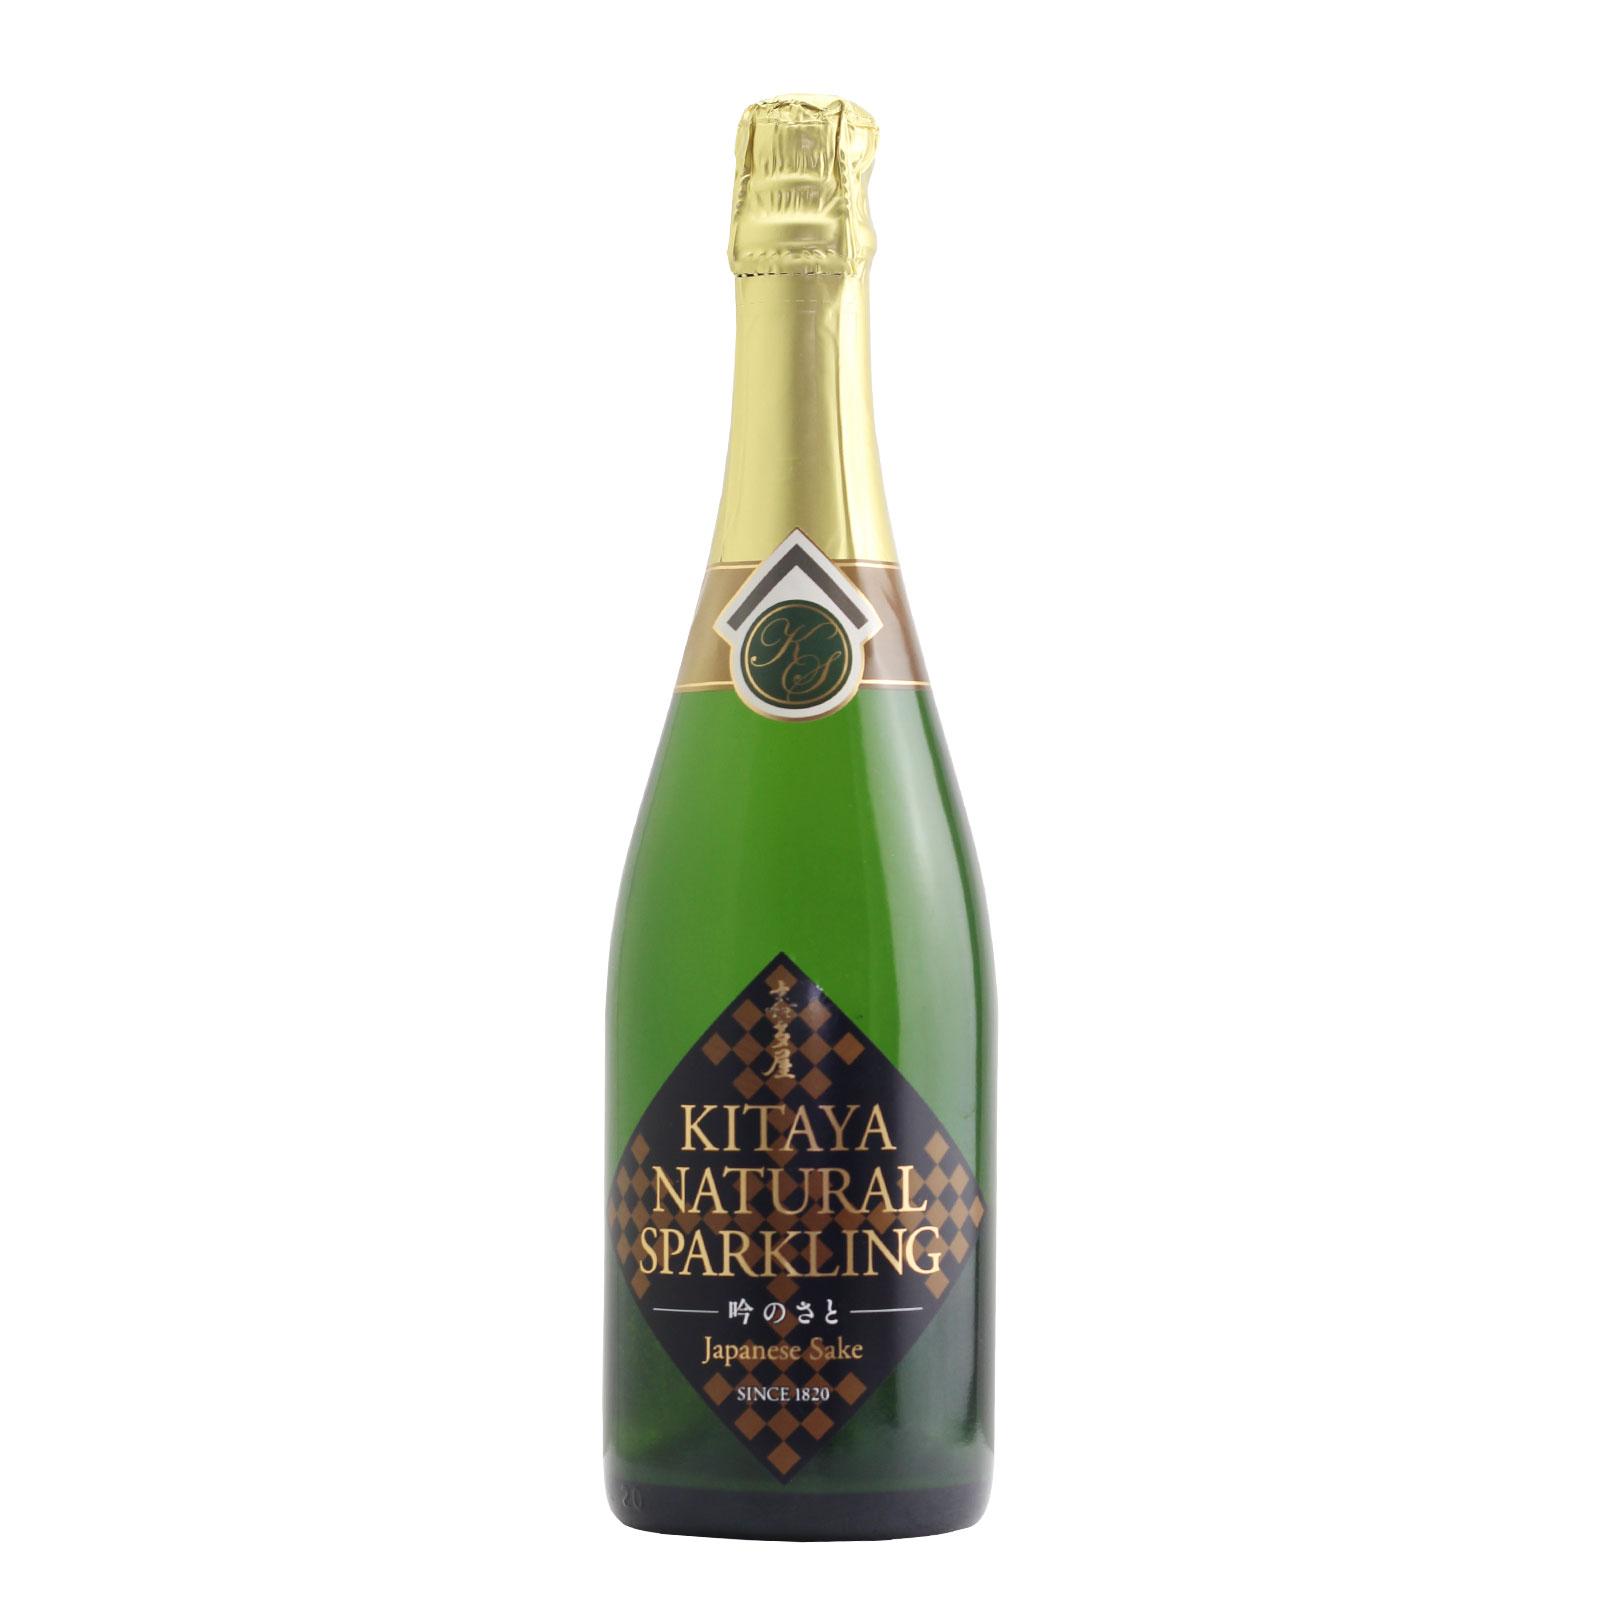 Kitaya Natural Sparkling Sake Gin-no-sato 12% 720ml